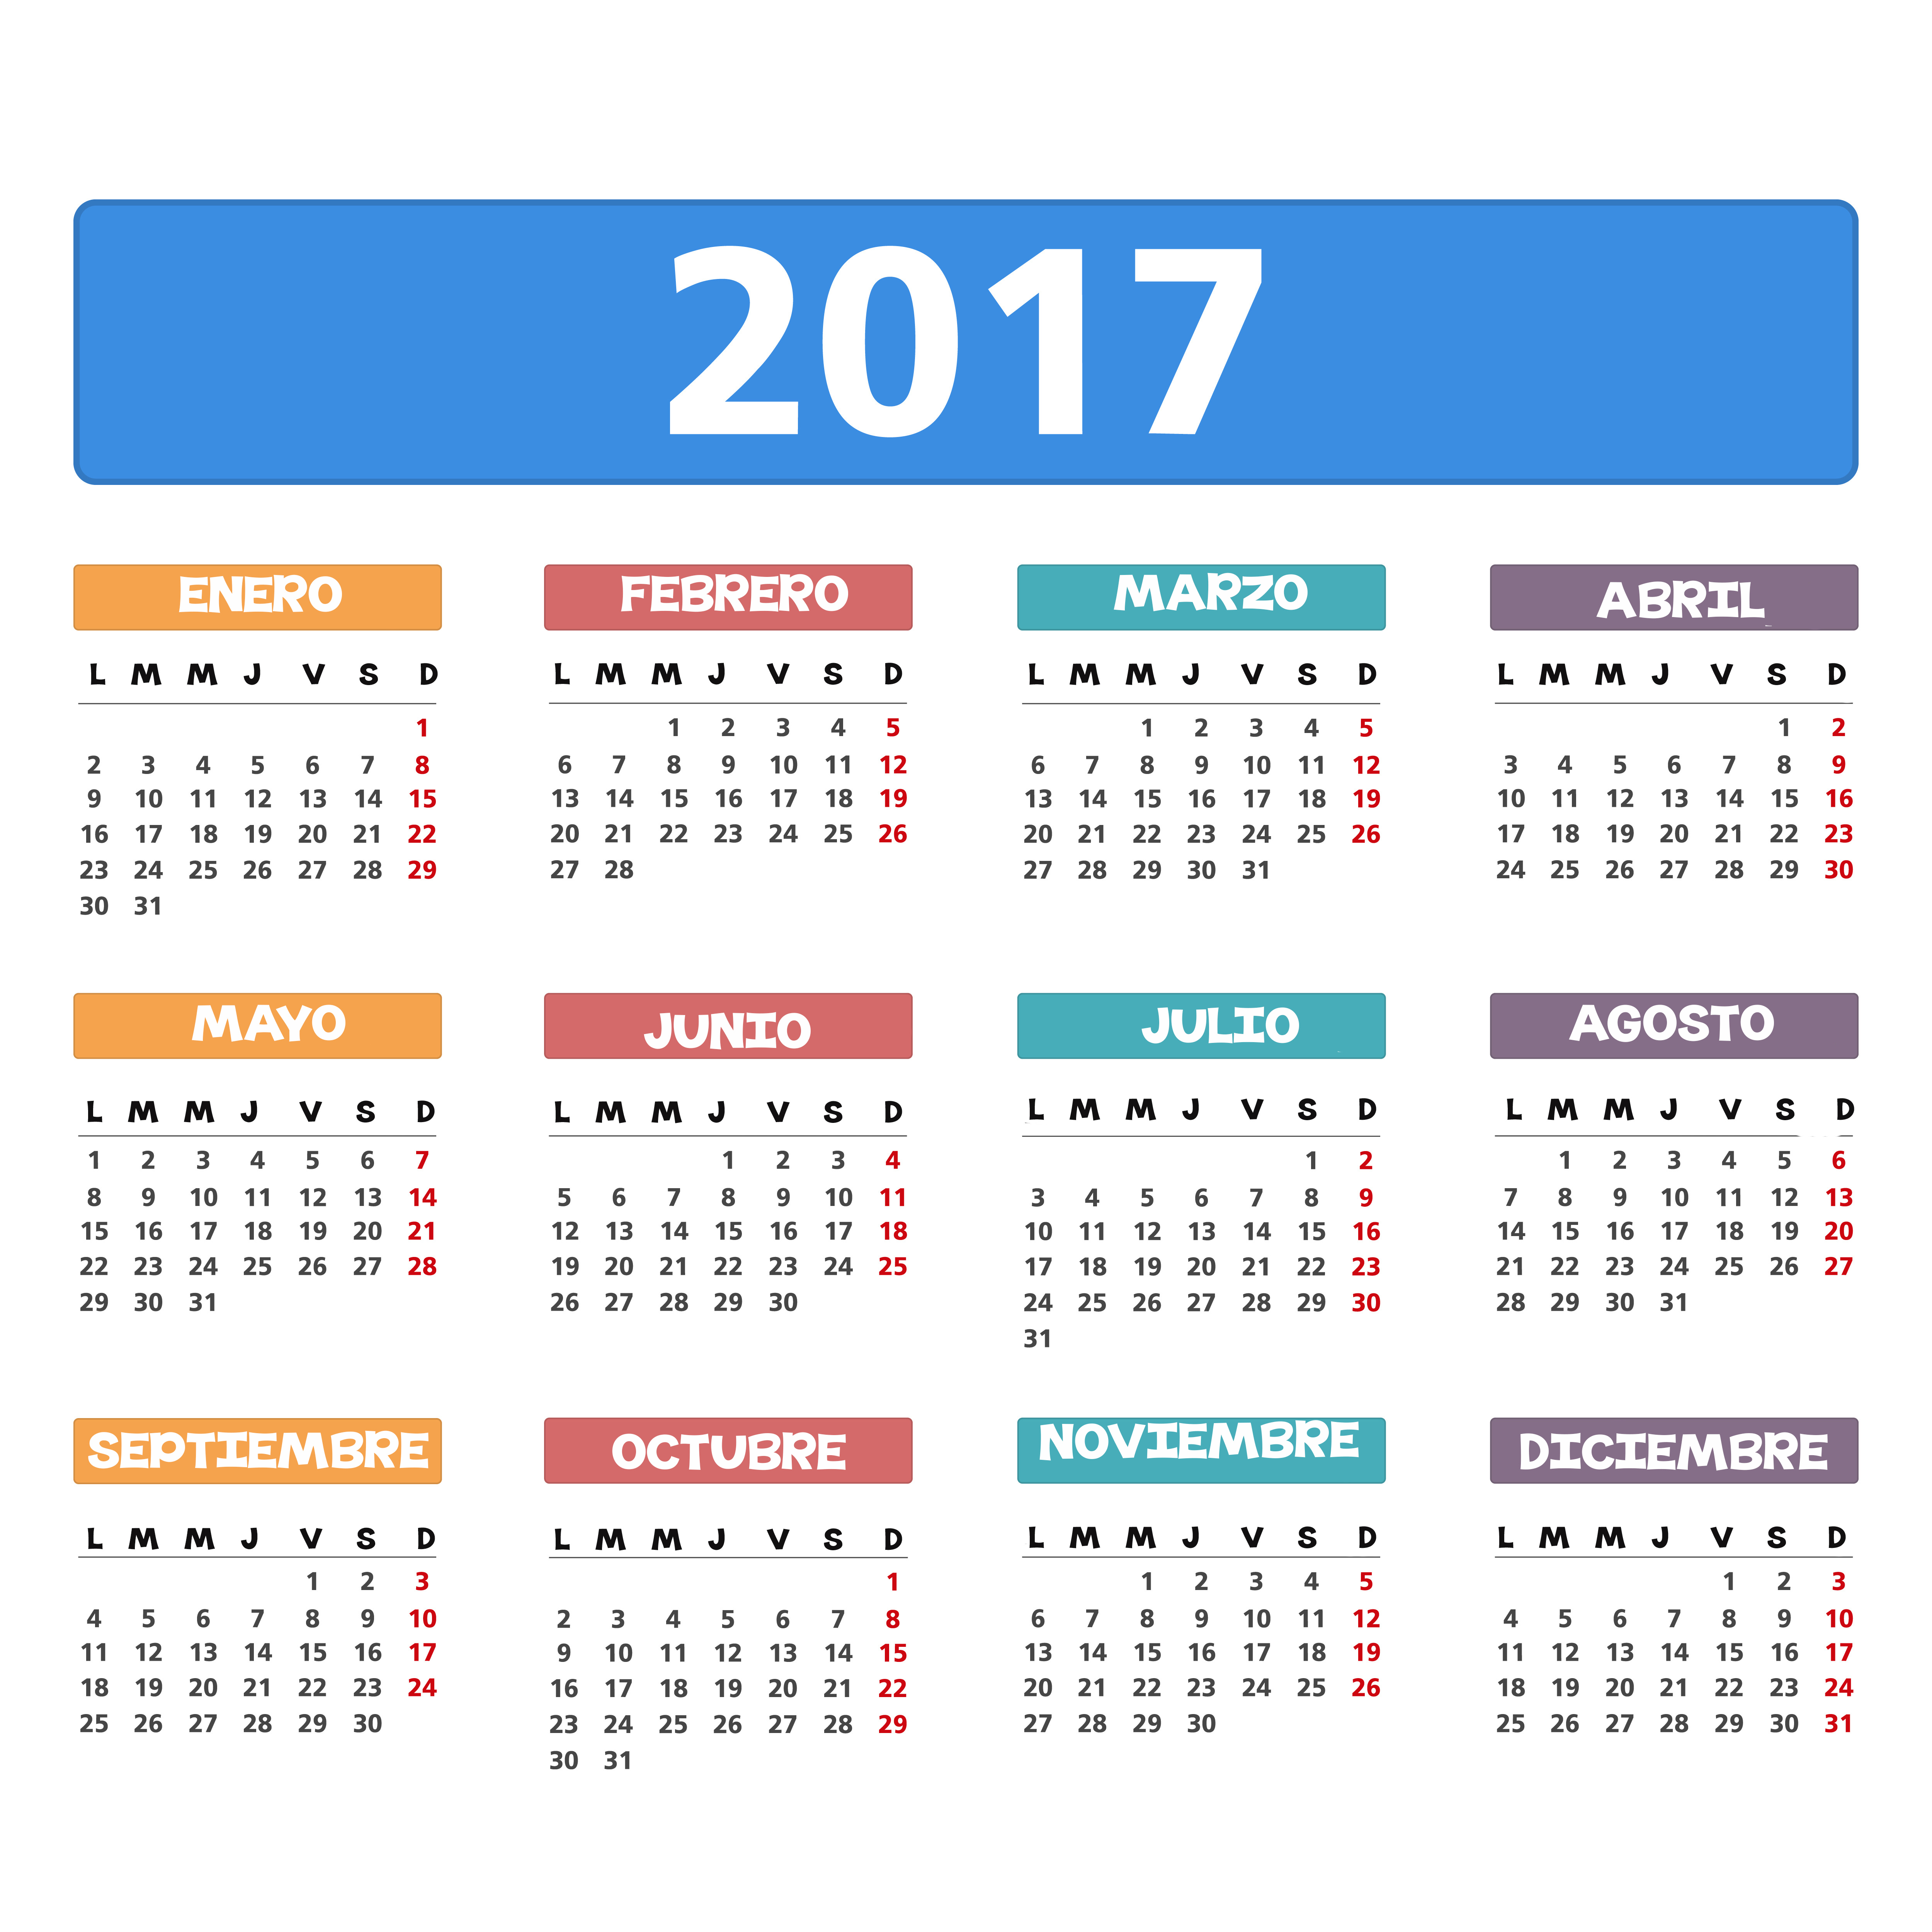 2017 Calendar - Imagenes Educativas